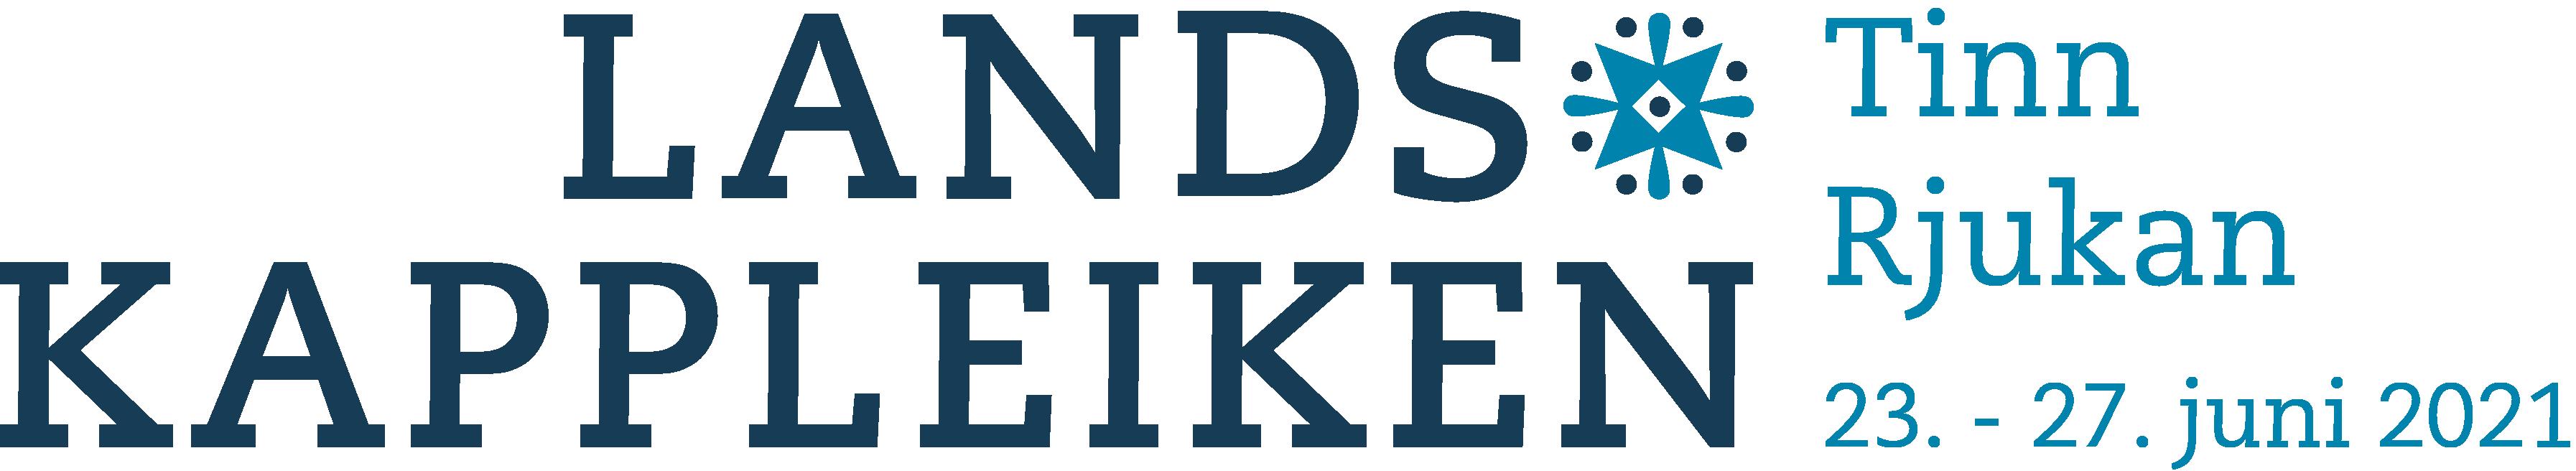 LK_TINN_2021_Tekst+logo_RGB_blå_mørk-kopilandskappleiken.png